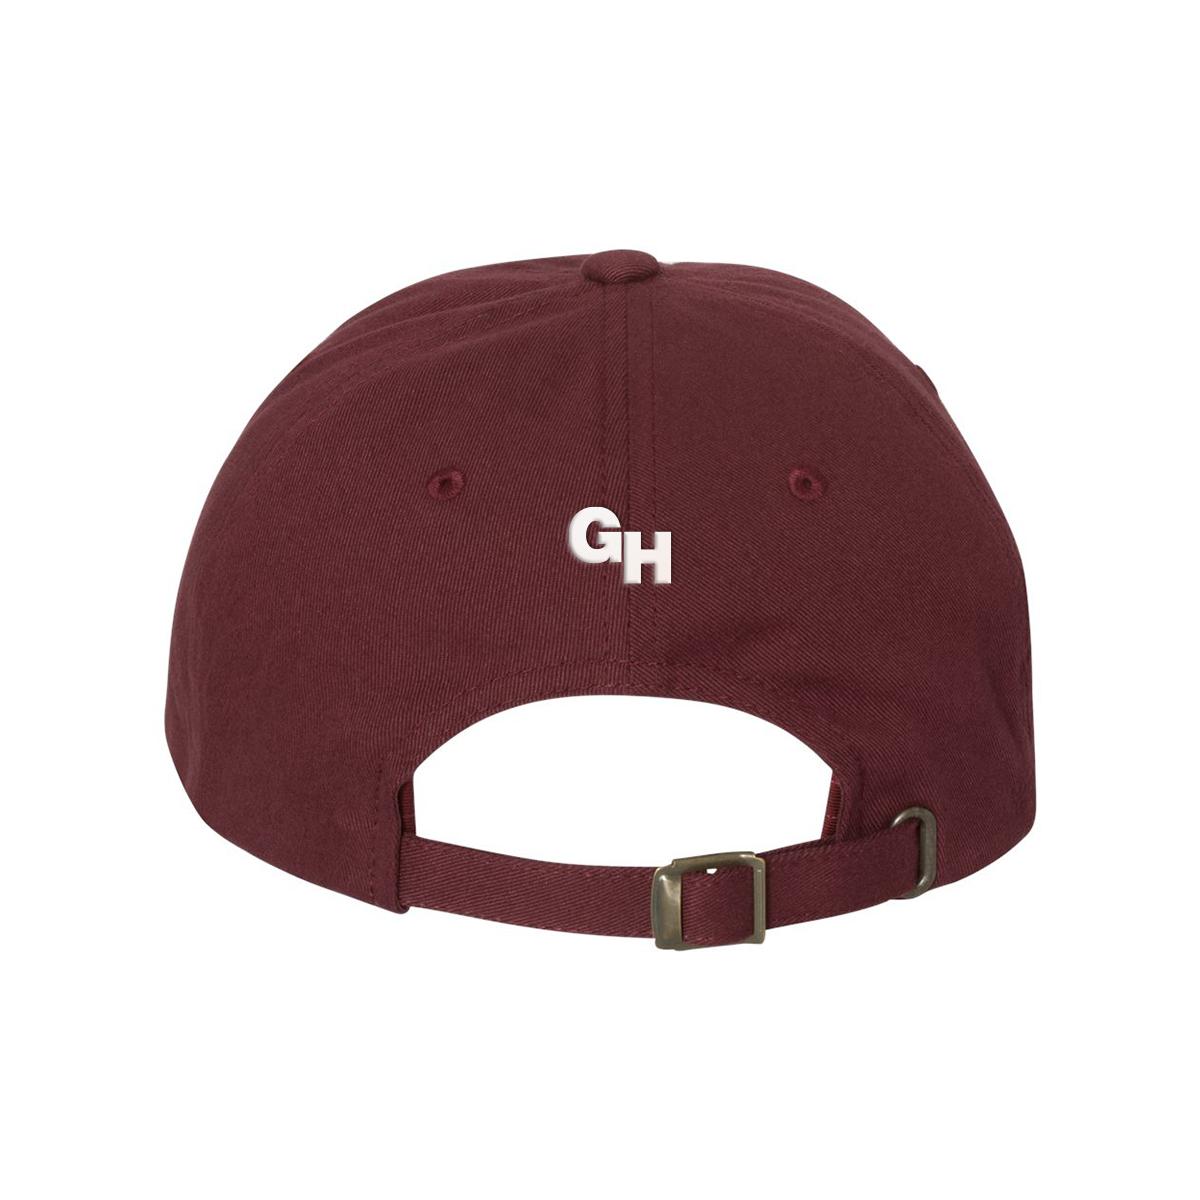 General Hospital Corinthos Baseball Hat (Burgundy)